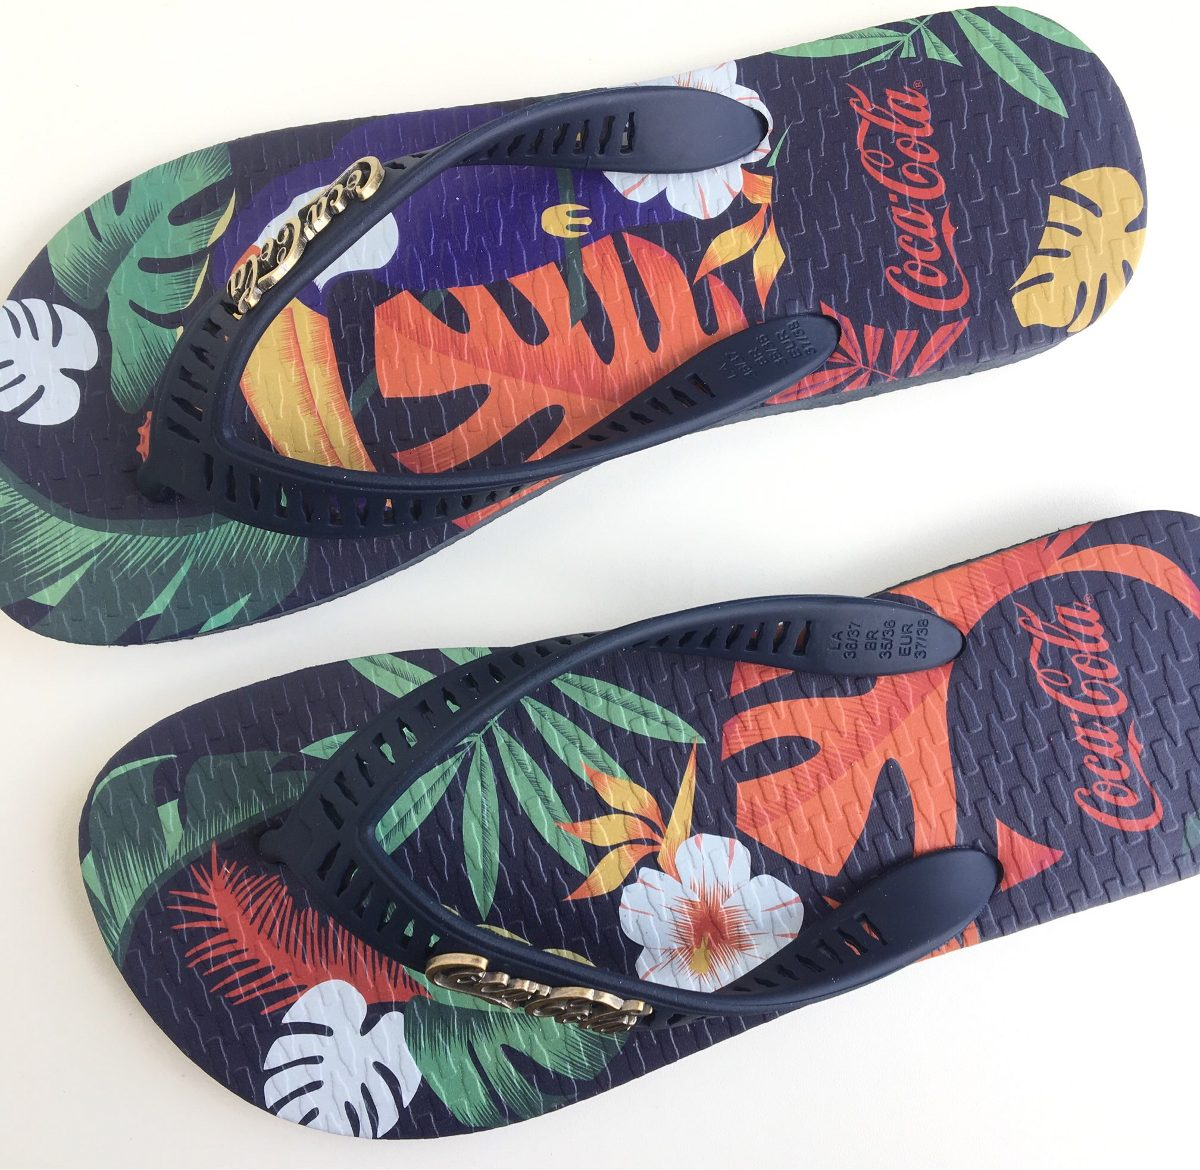 2695f9e435 chinelo masculino coca cola shoes tropicoke tucano original. Carregando  zoom.